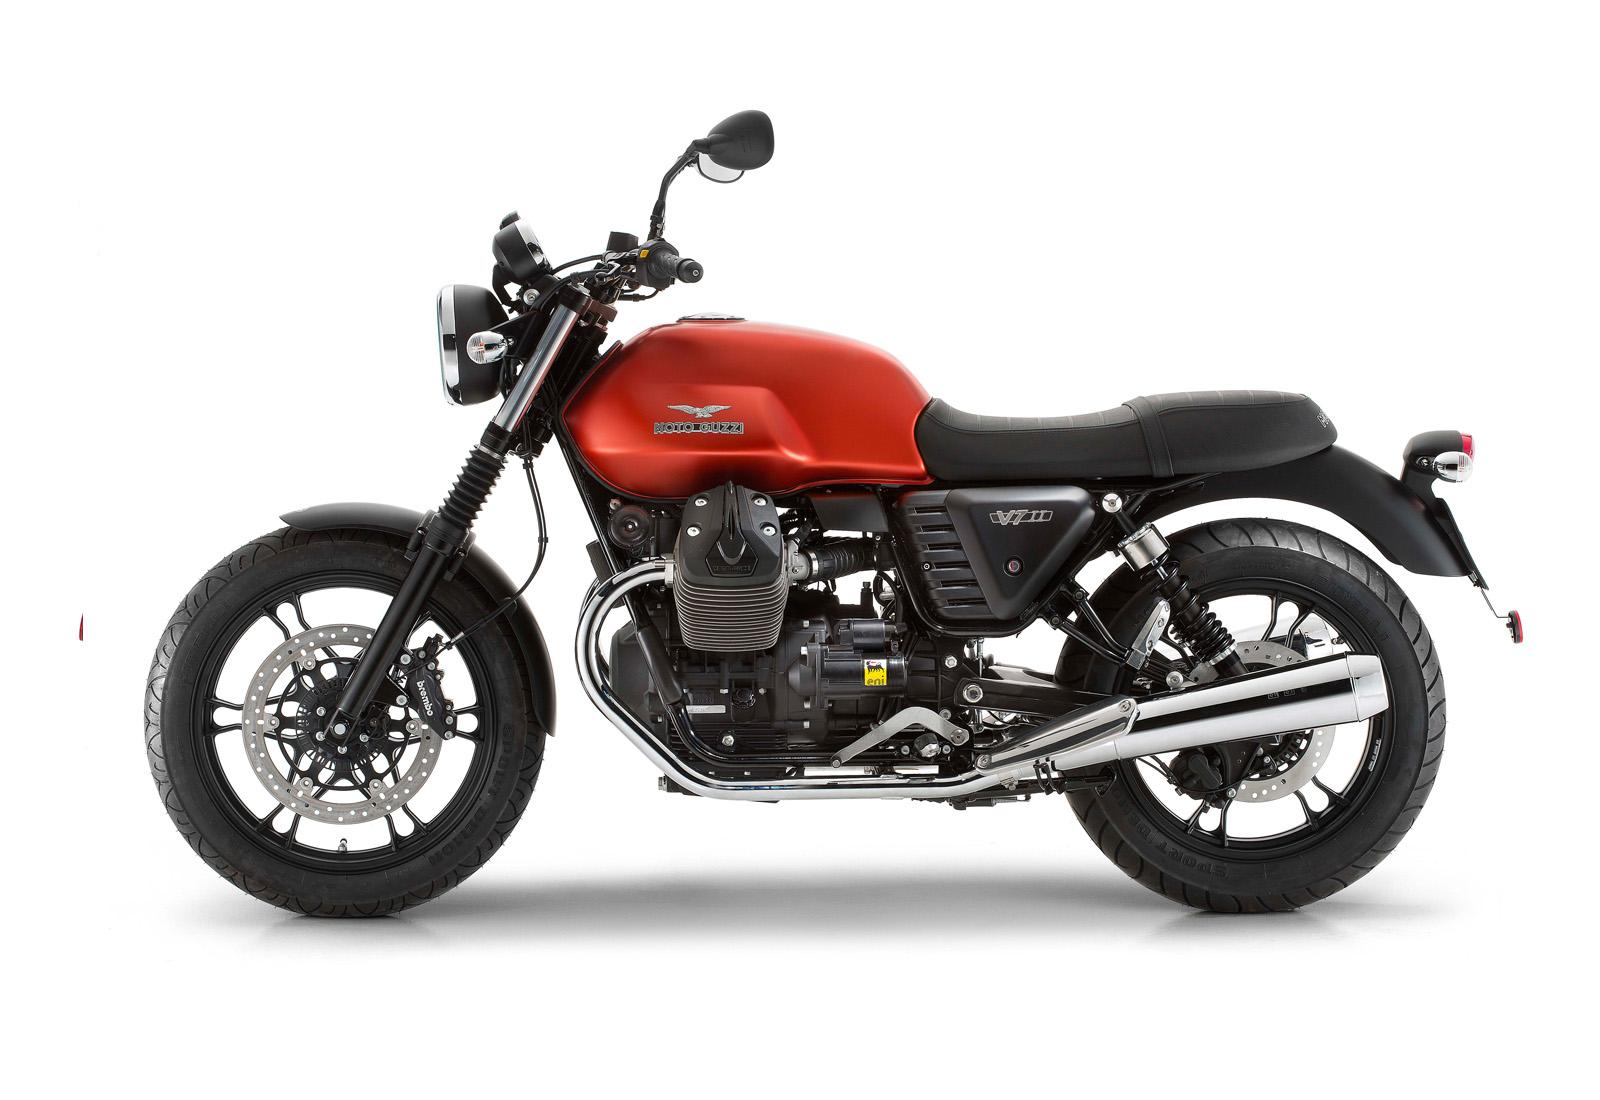 Moto Guzzi demo